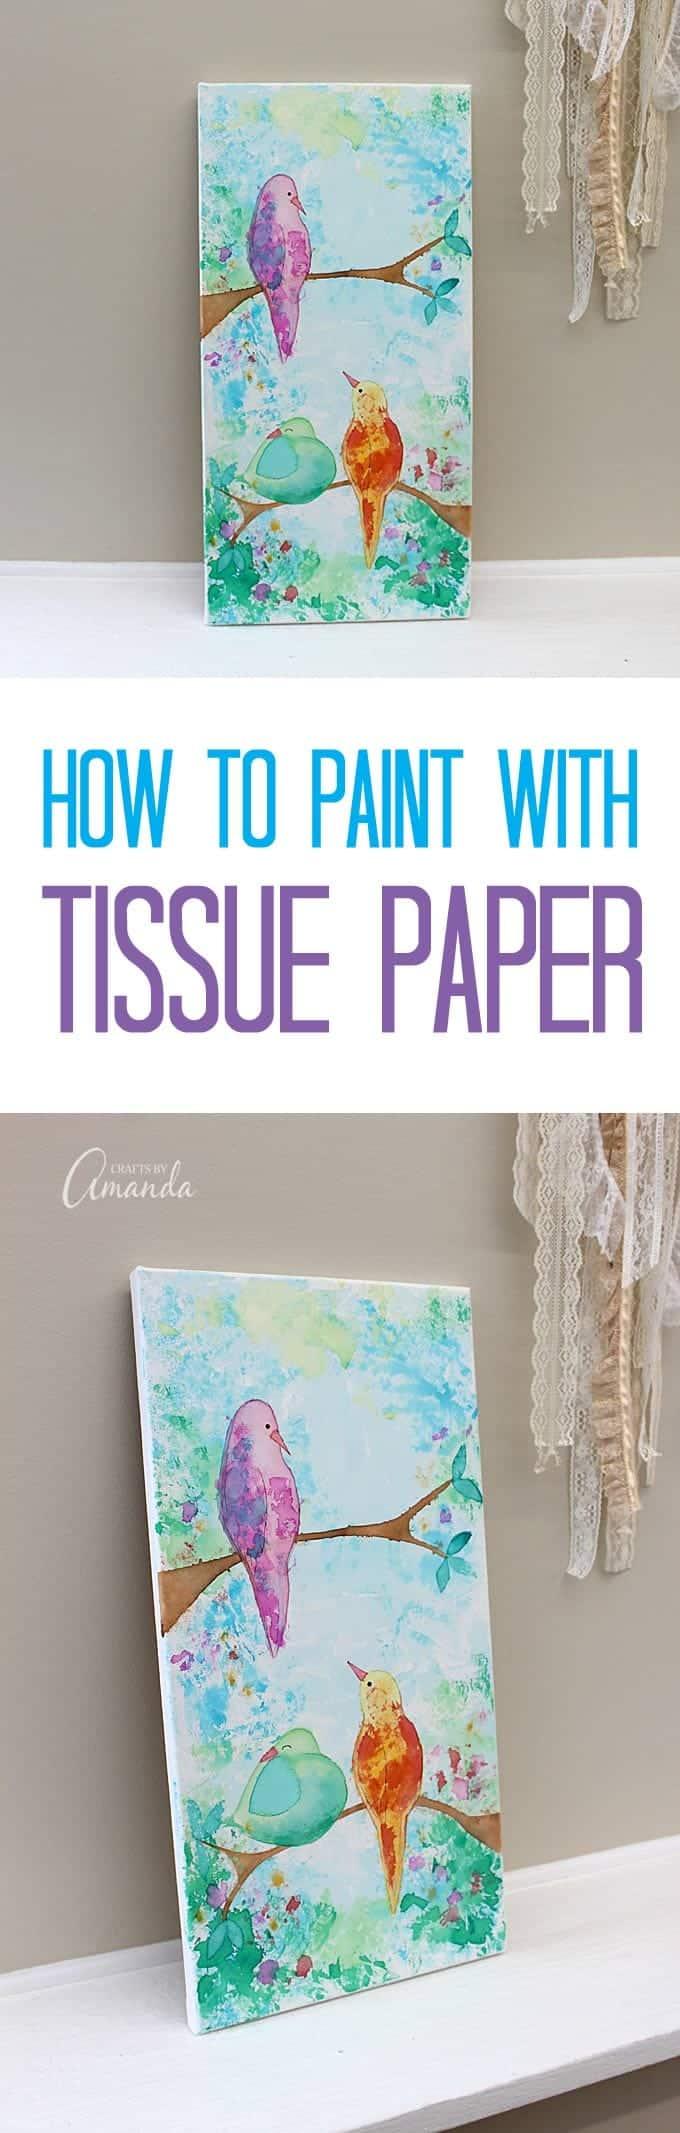 Bleeding Tissue Paper Birds On Canvas Wall Art